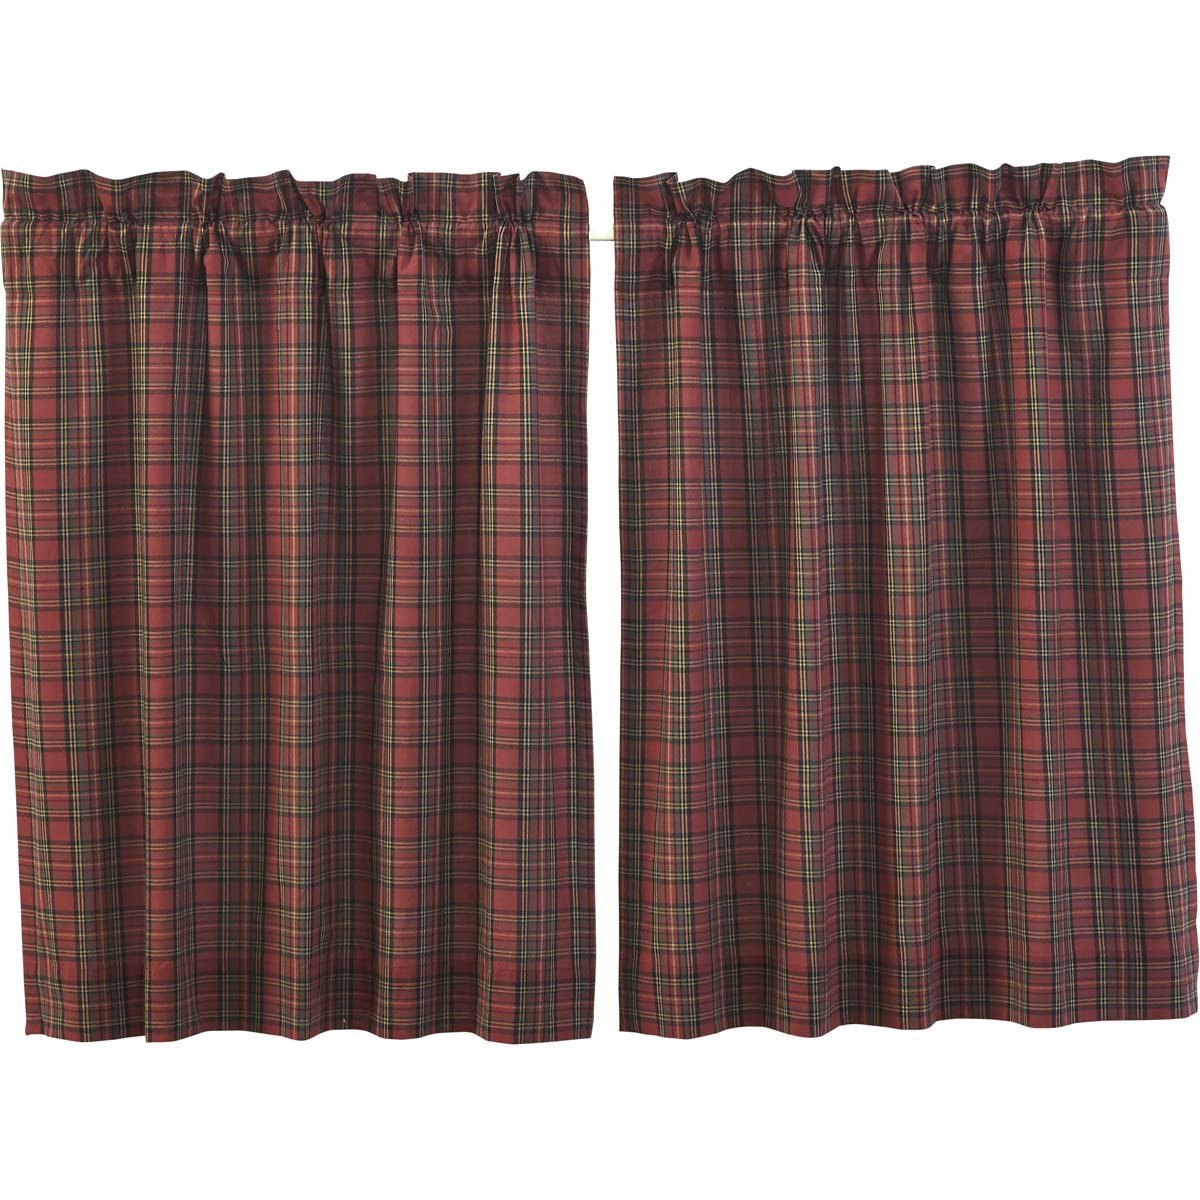 Vhc Brands Primitive Rustic & Lodge Kitchen Window Curtains Tartan Plaid  Red Tier Pair L24 X W36 Regarding Recent Red Primitive Kitchen Curtains (View 16 of 20)